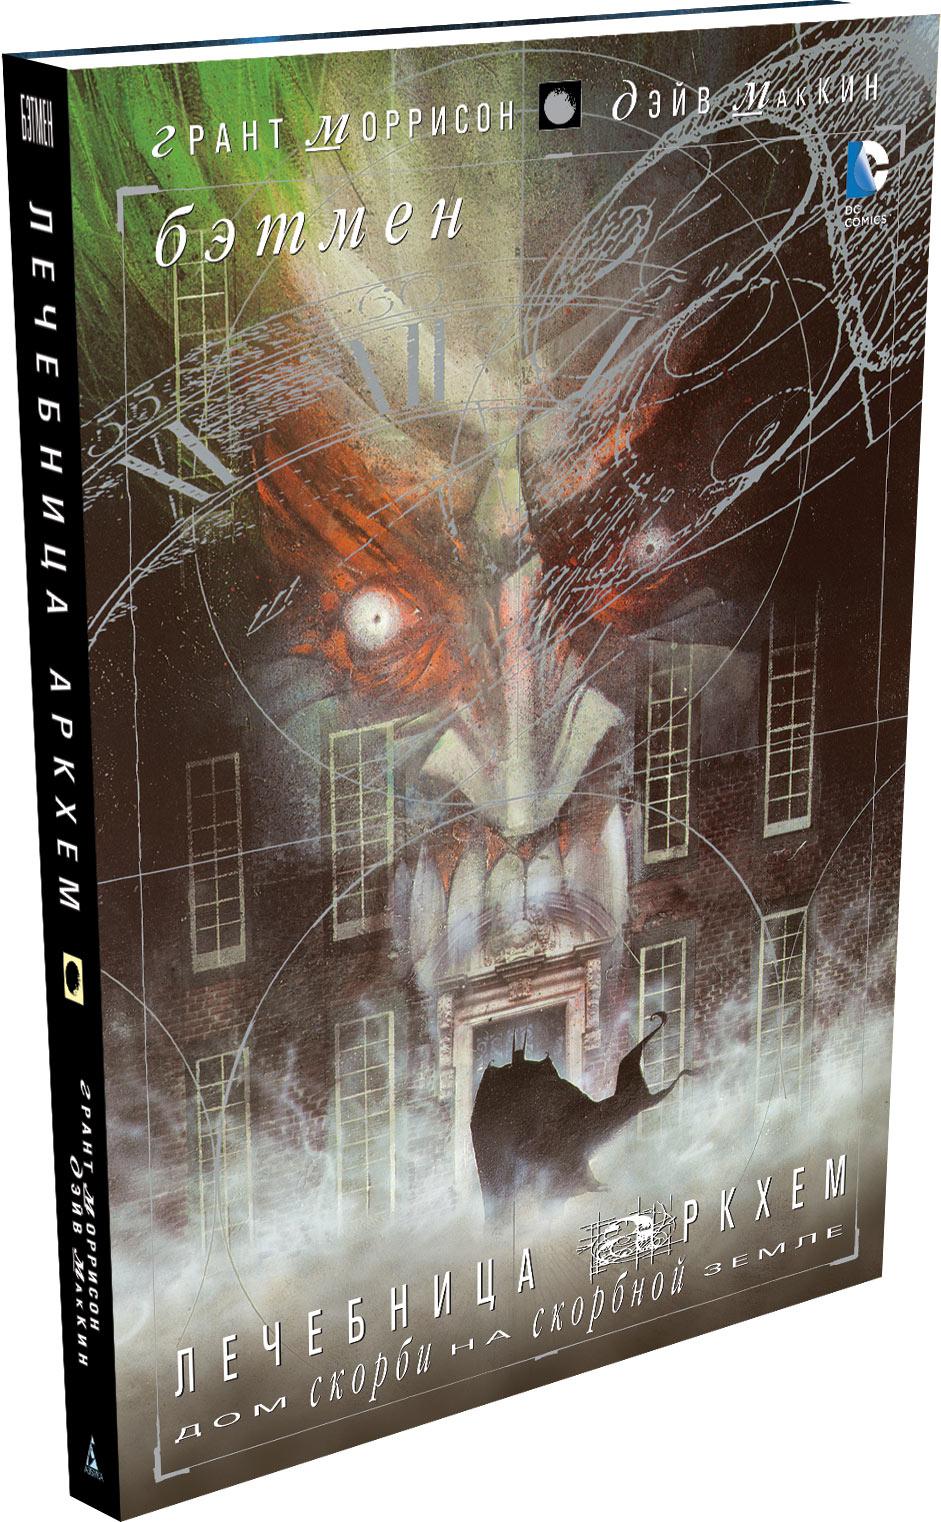 Читать онлайн комикс бэтмен лечебница аркхем